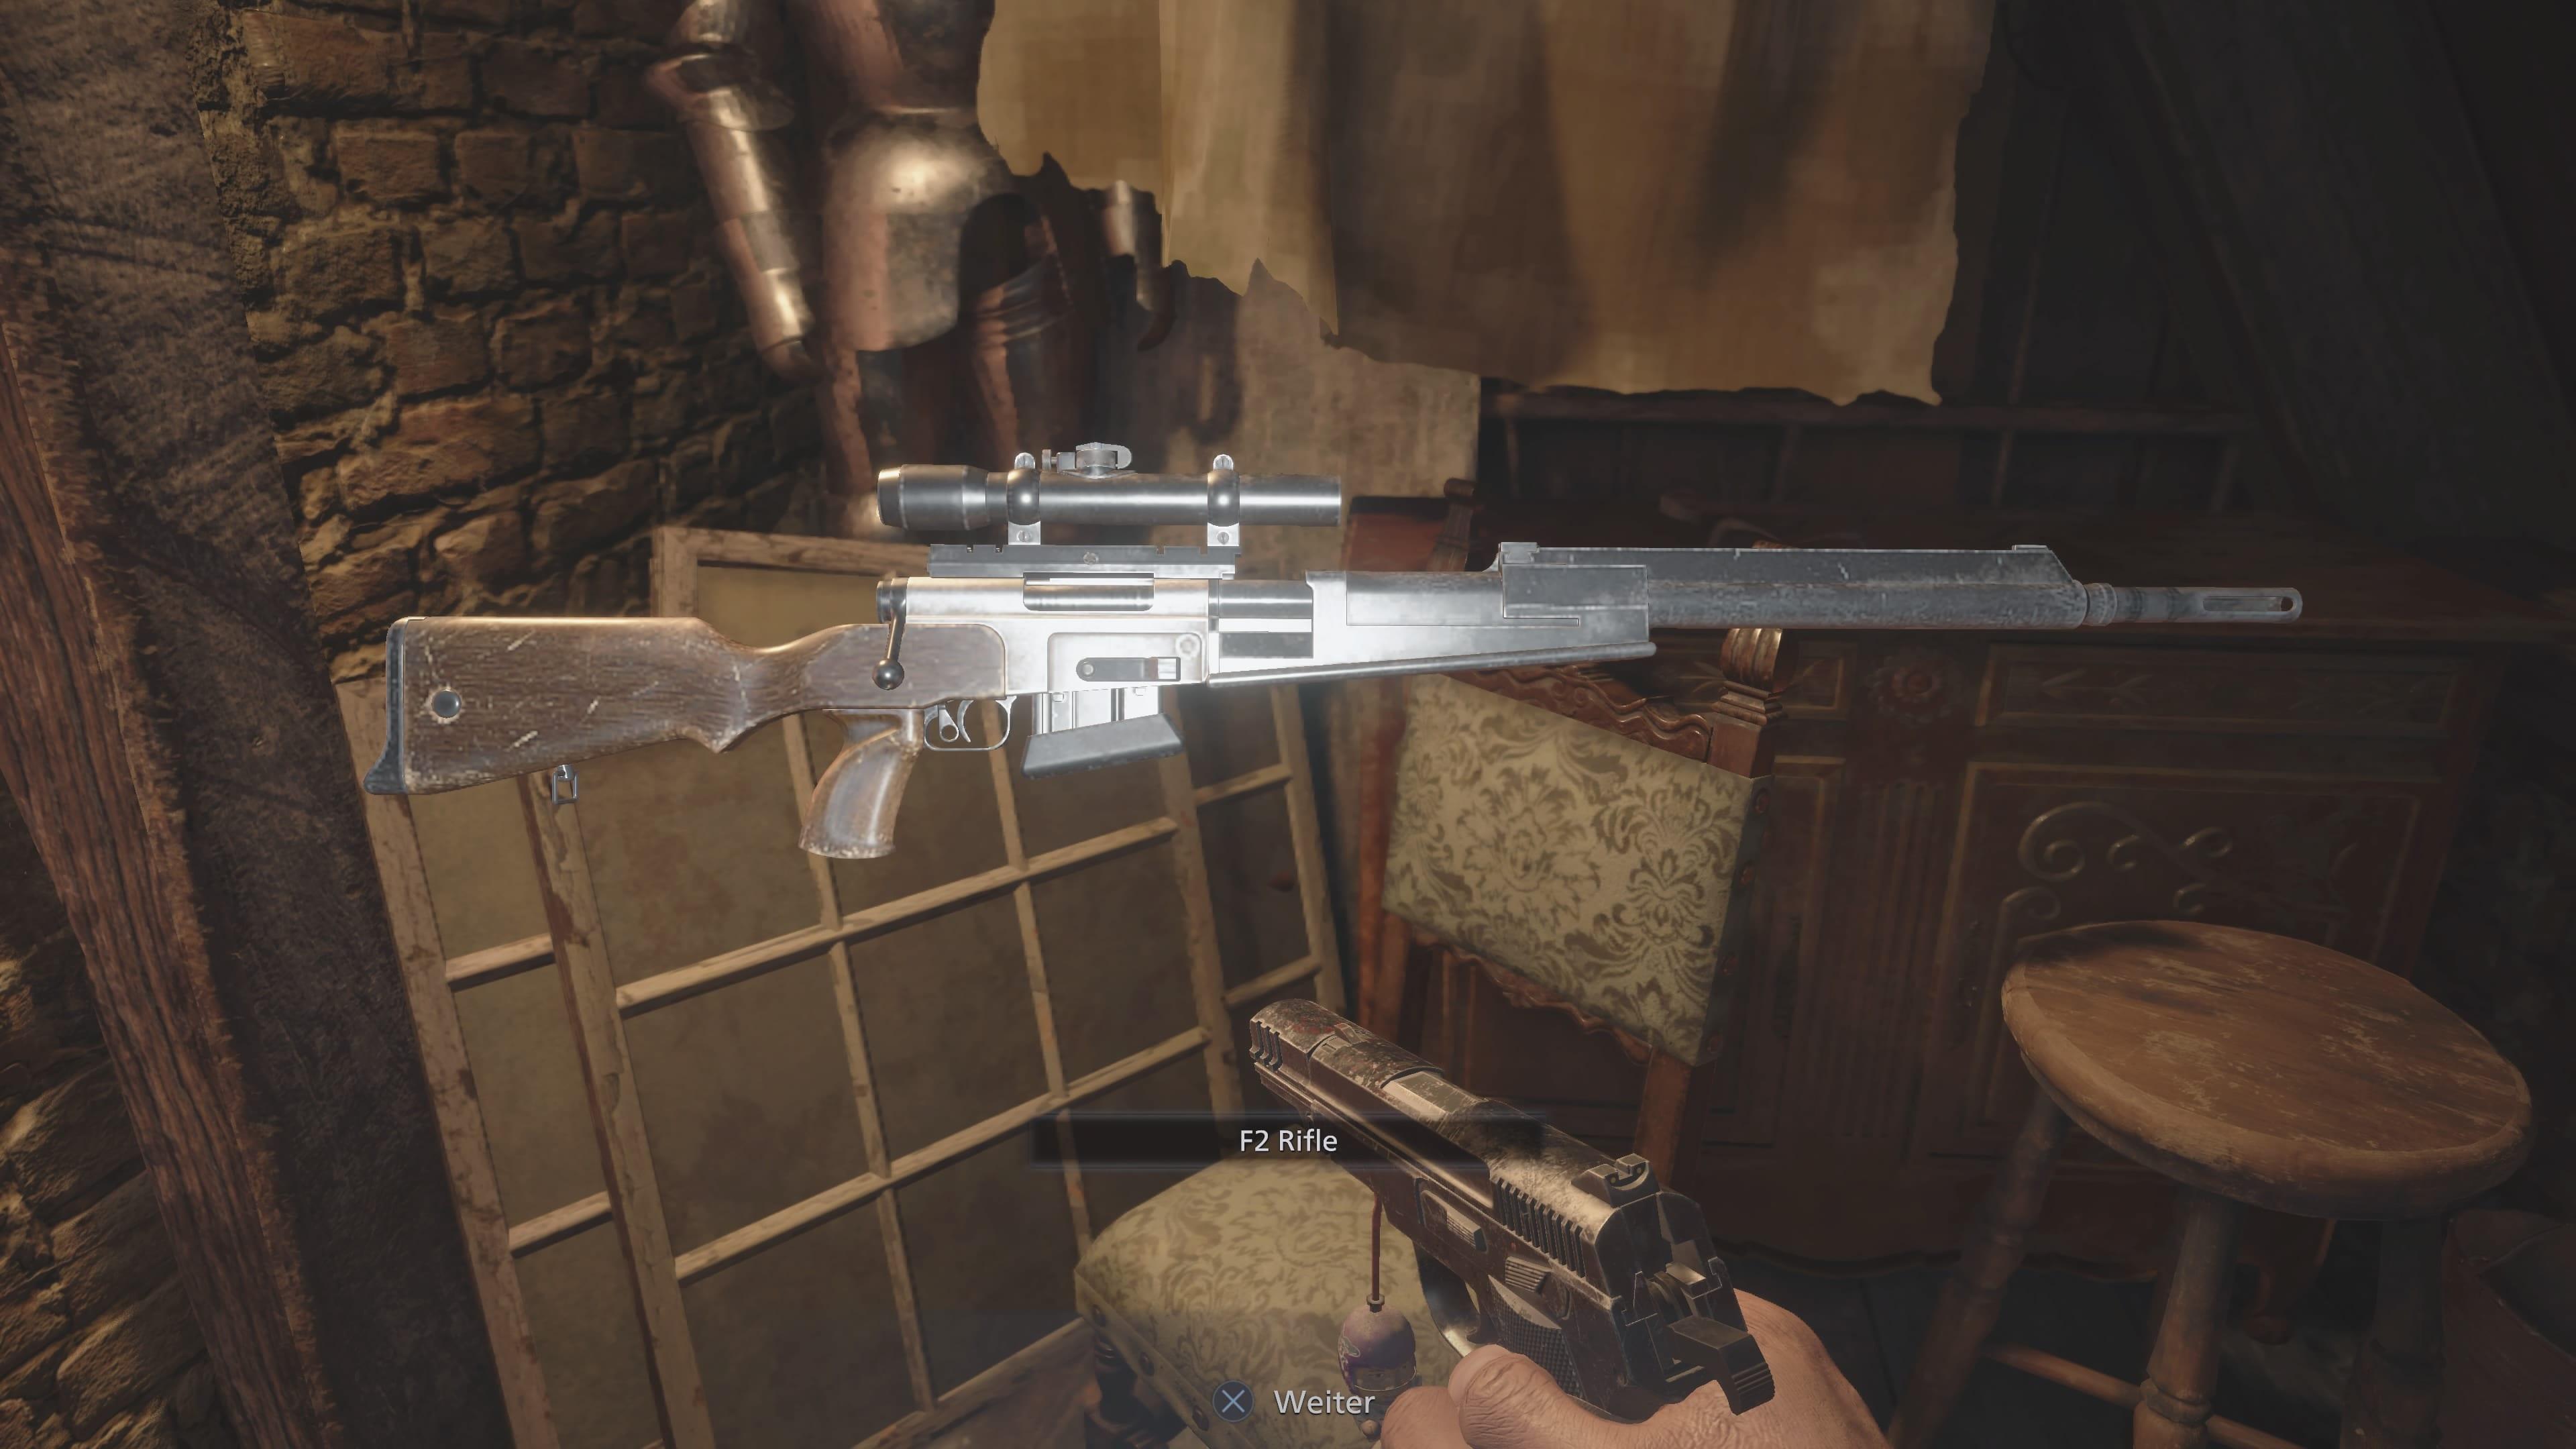 Resident Evil 8: Fundort der F2 Rifle (Lösung)